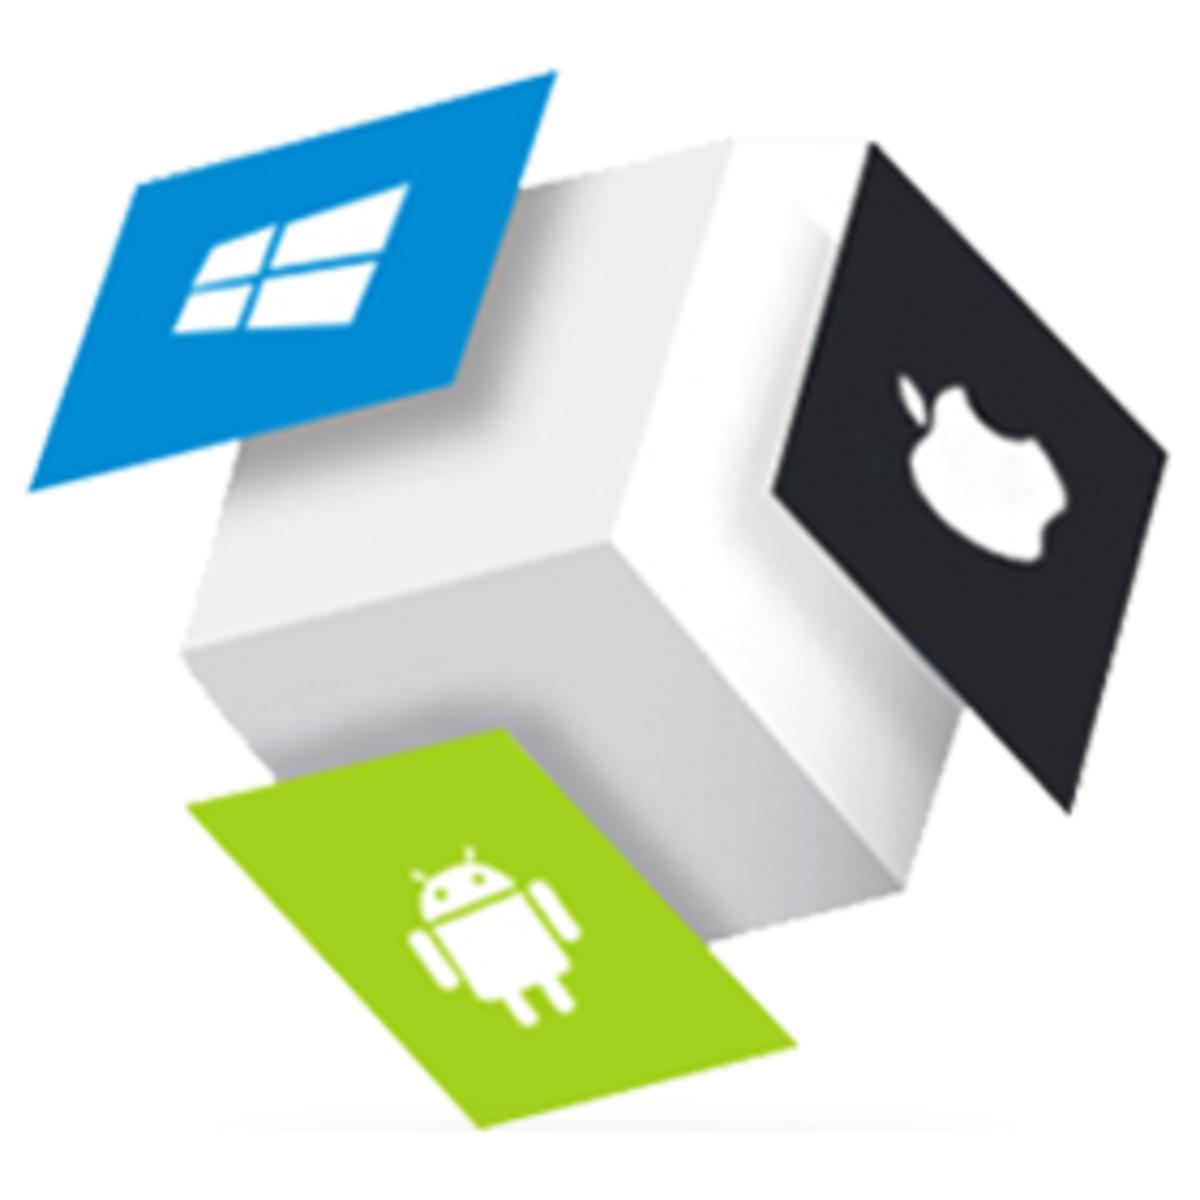 Multiplatform Mobile App Development with Web Technologies ...